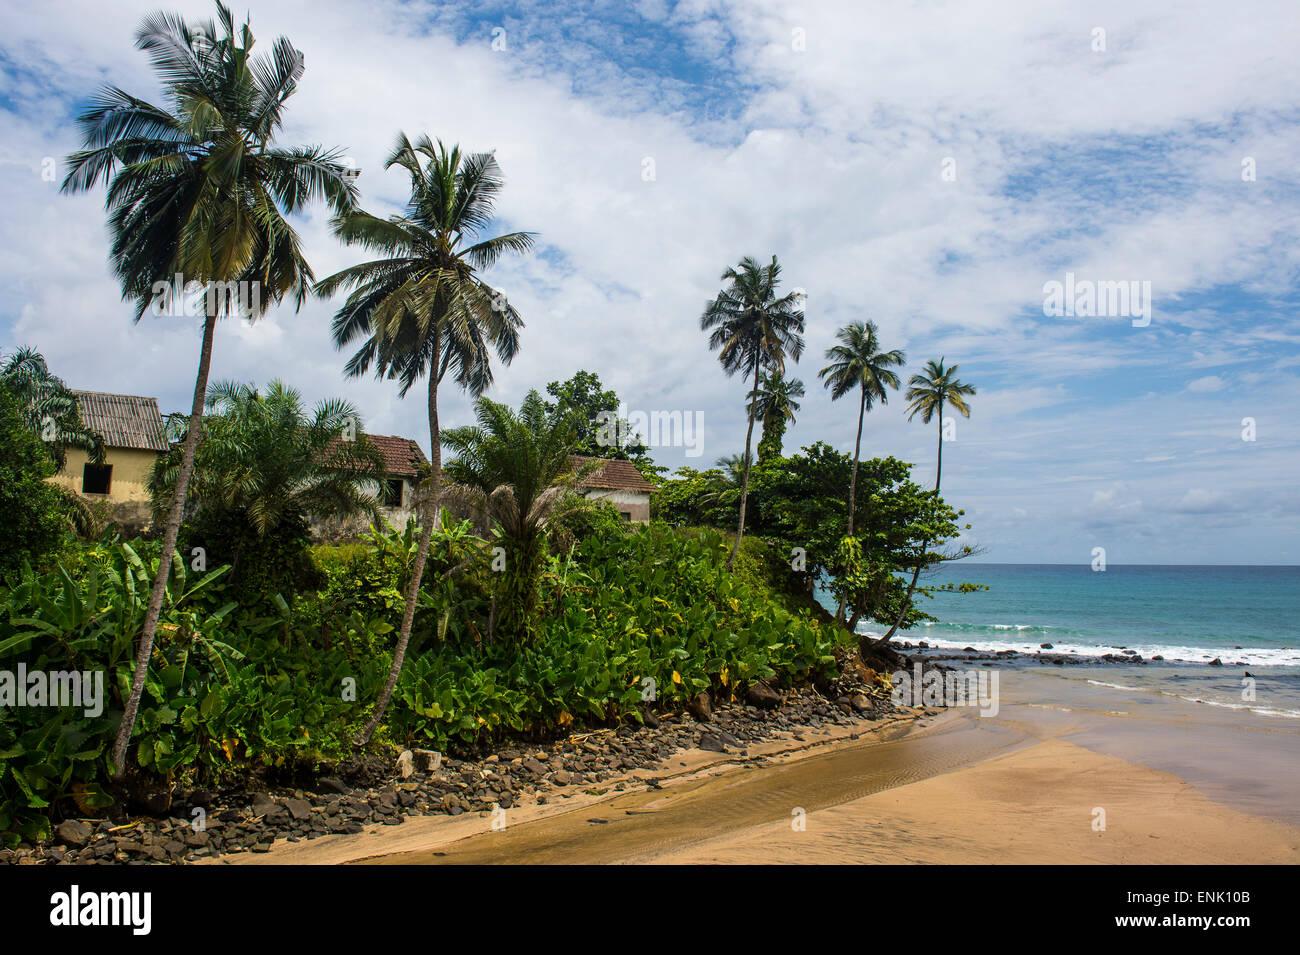 Kolonialbauten Caue, Ostküste von São Tomé, Sao Tome und Principe, Atlantik, Afrika Stockbild